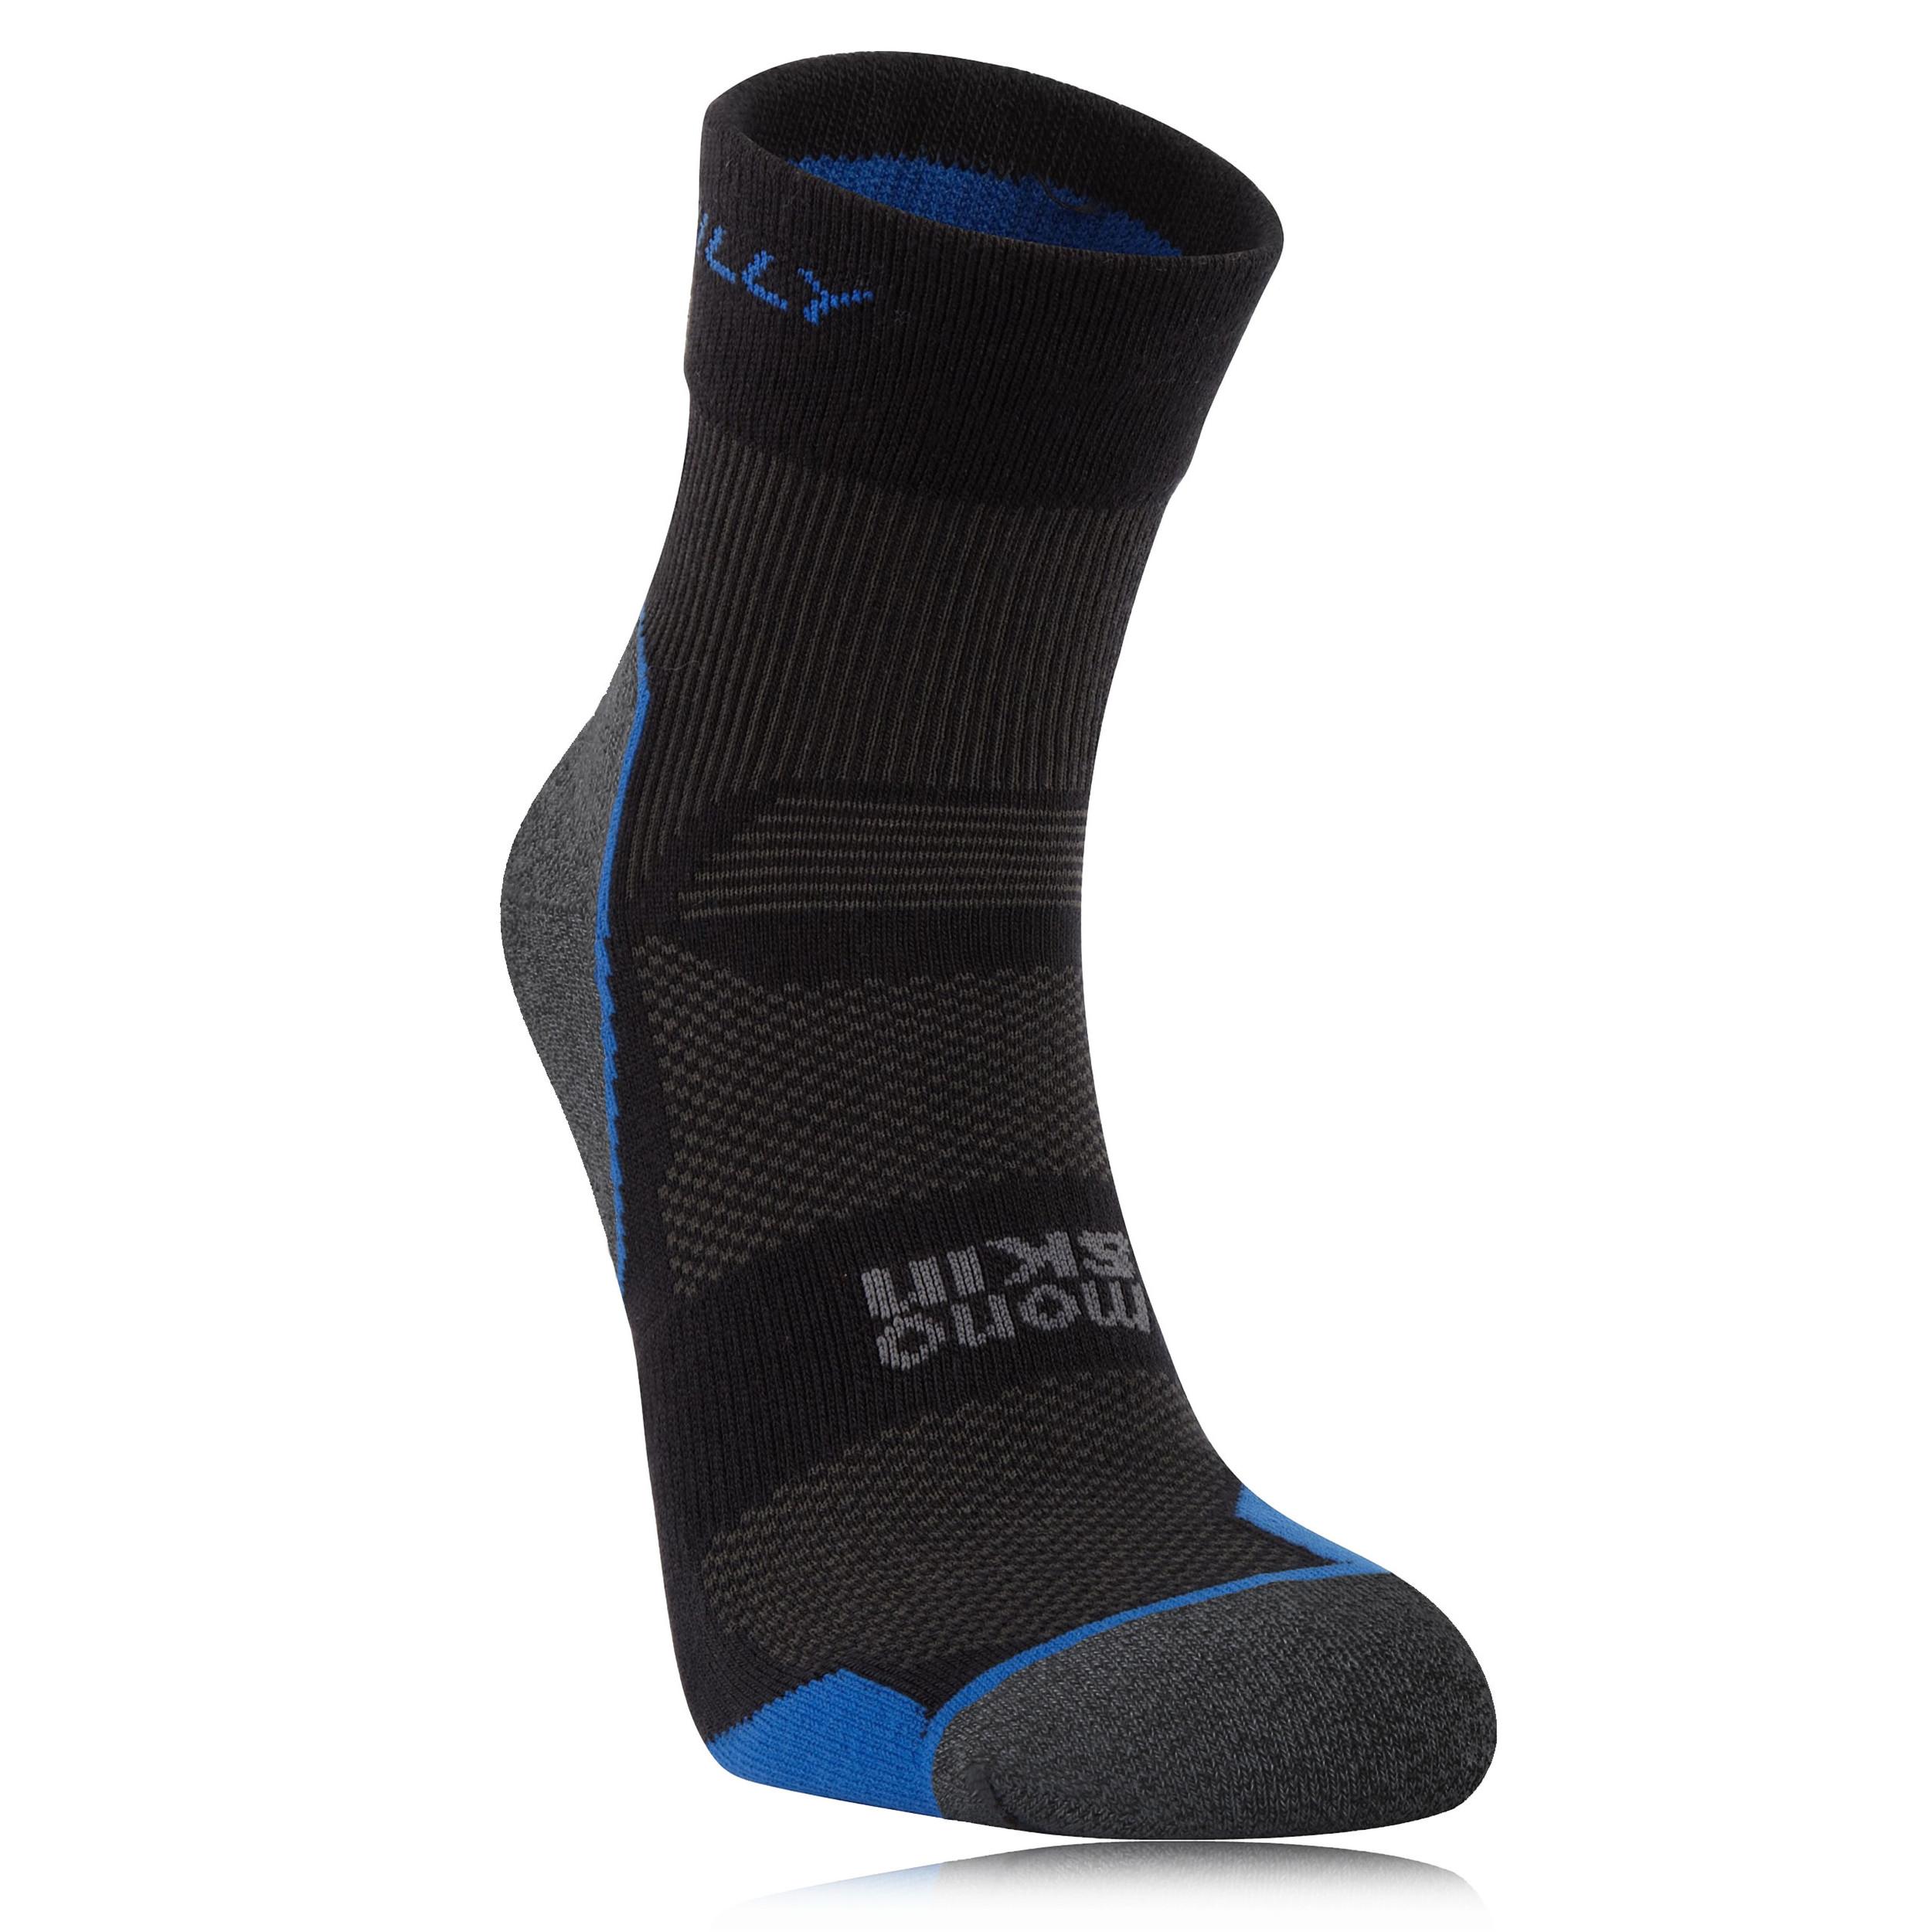 Anklet Shoes For Mens